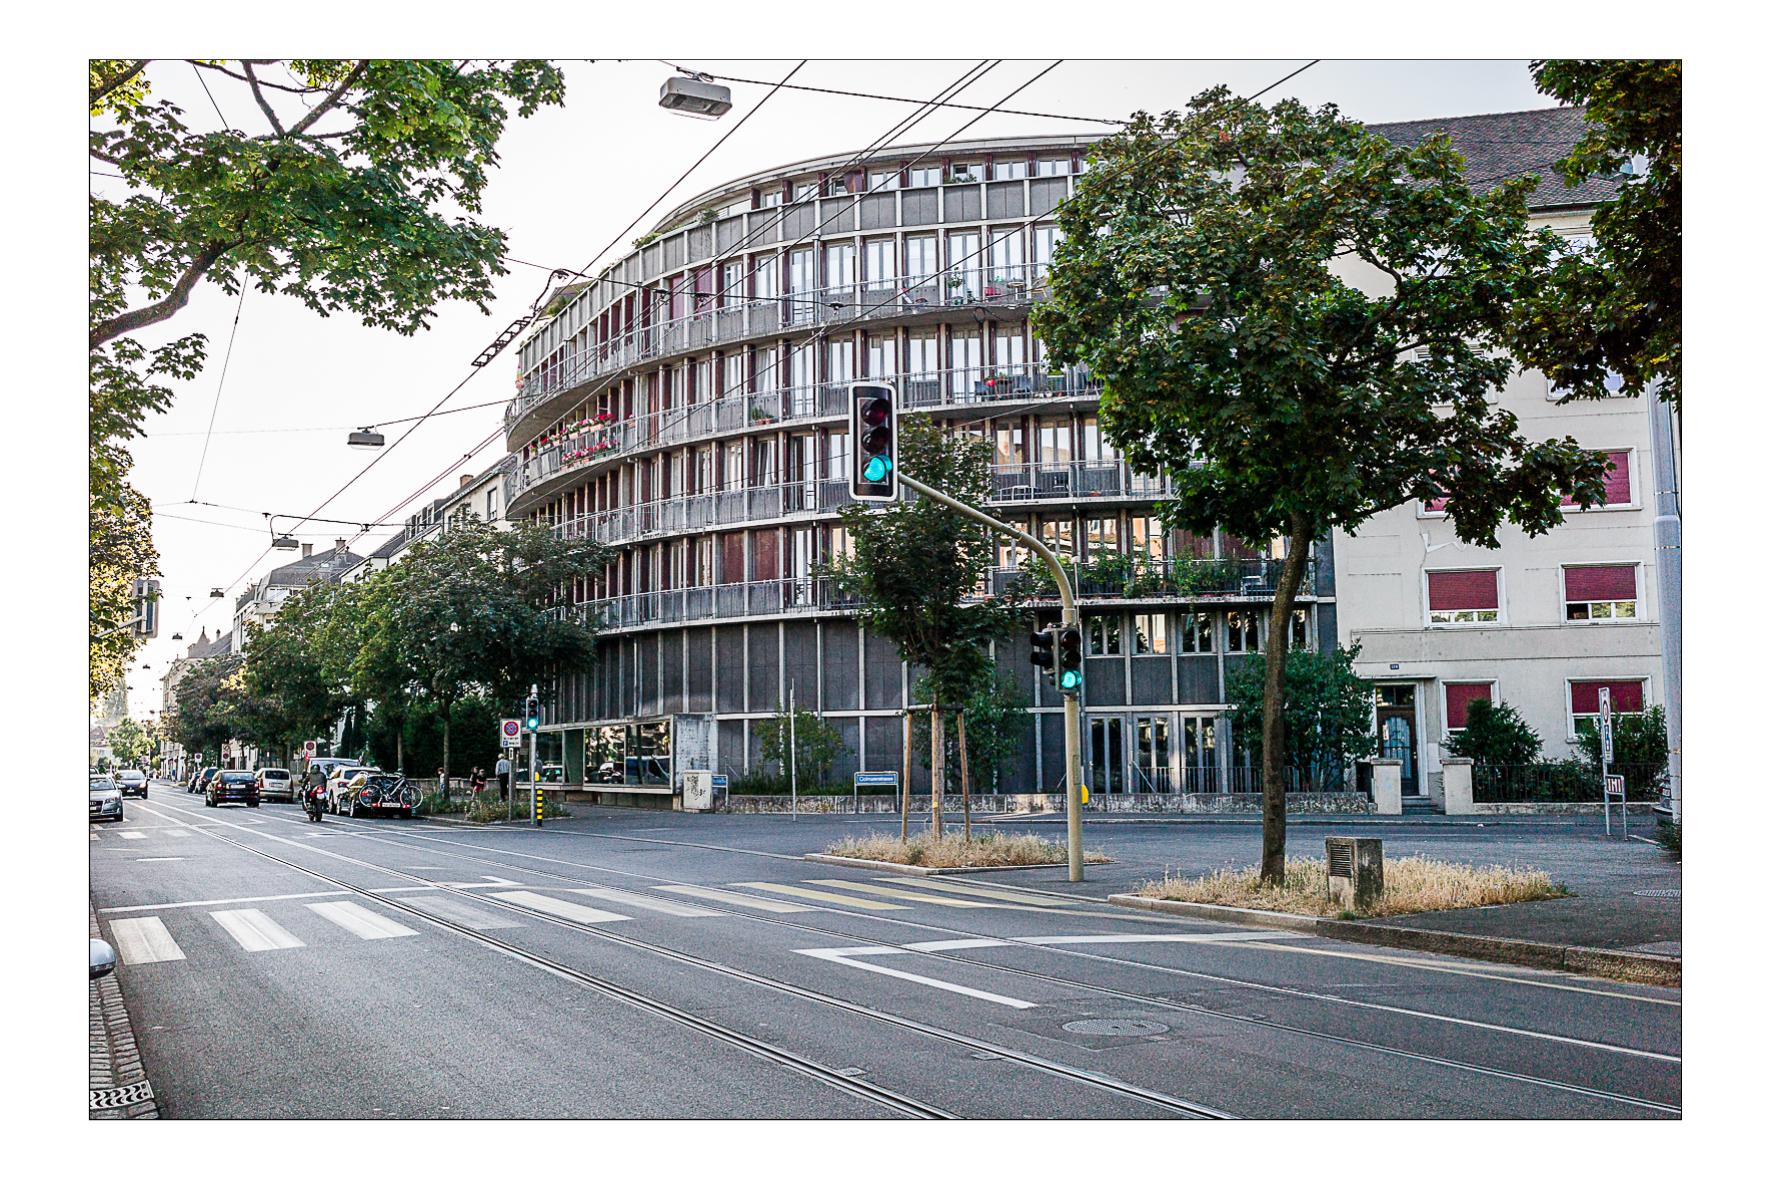 Résidence Allswillerstrasse, Bâles 2014  Herzog De Meuron Architectes 1988